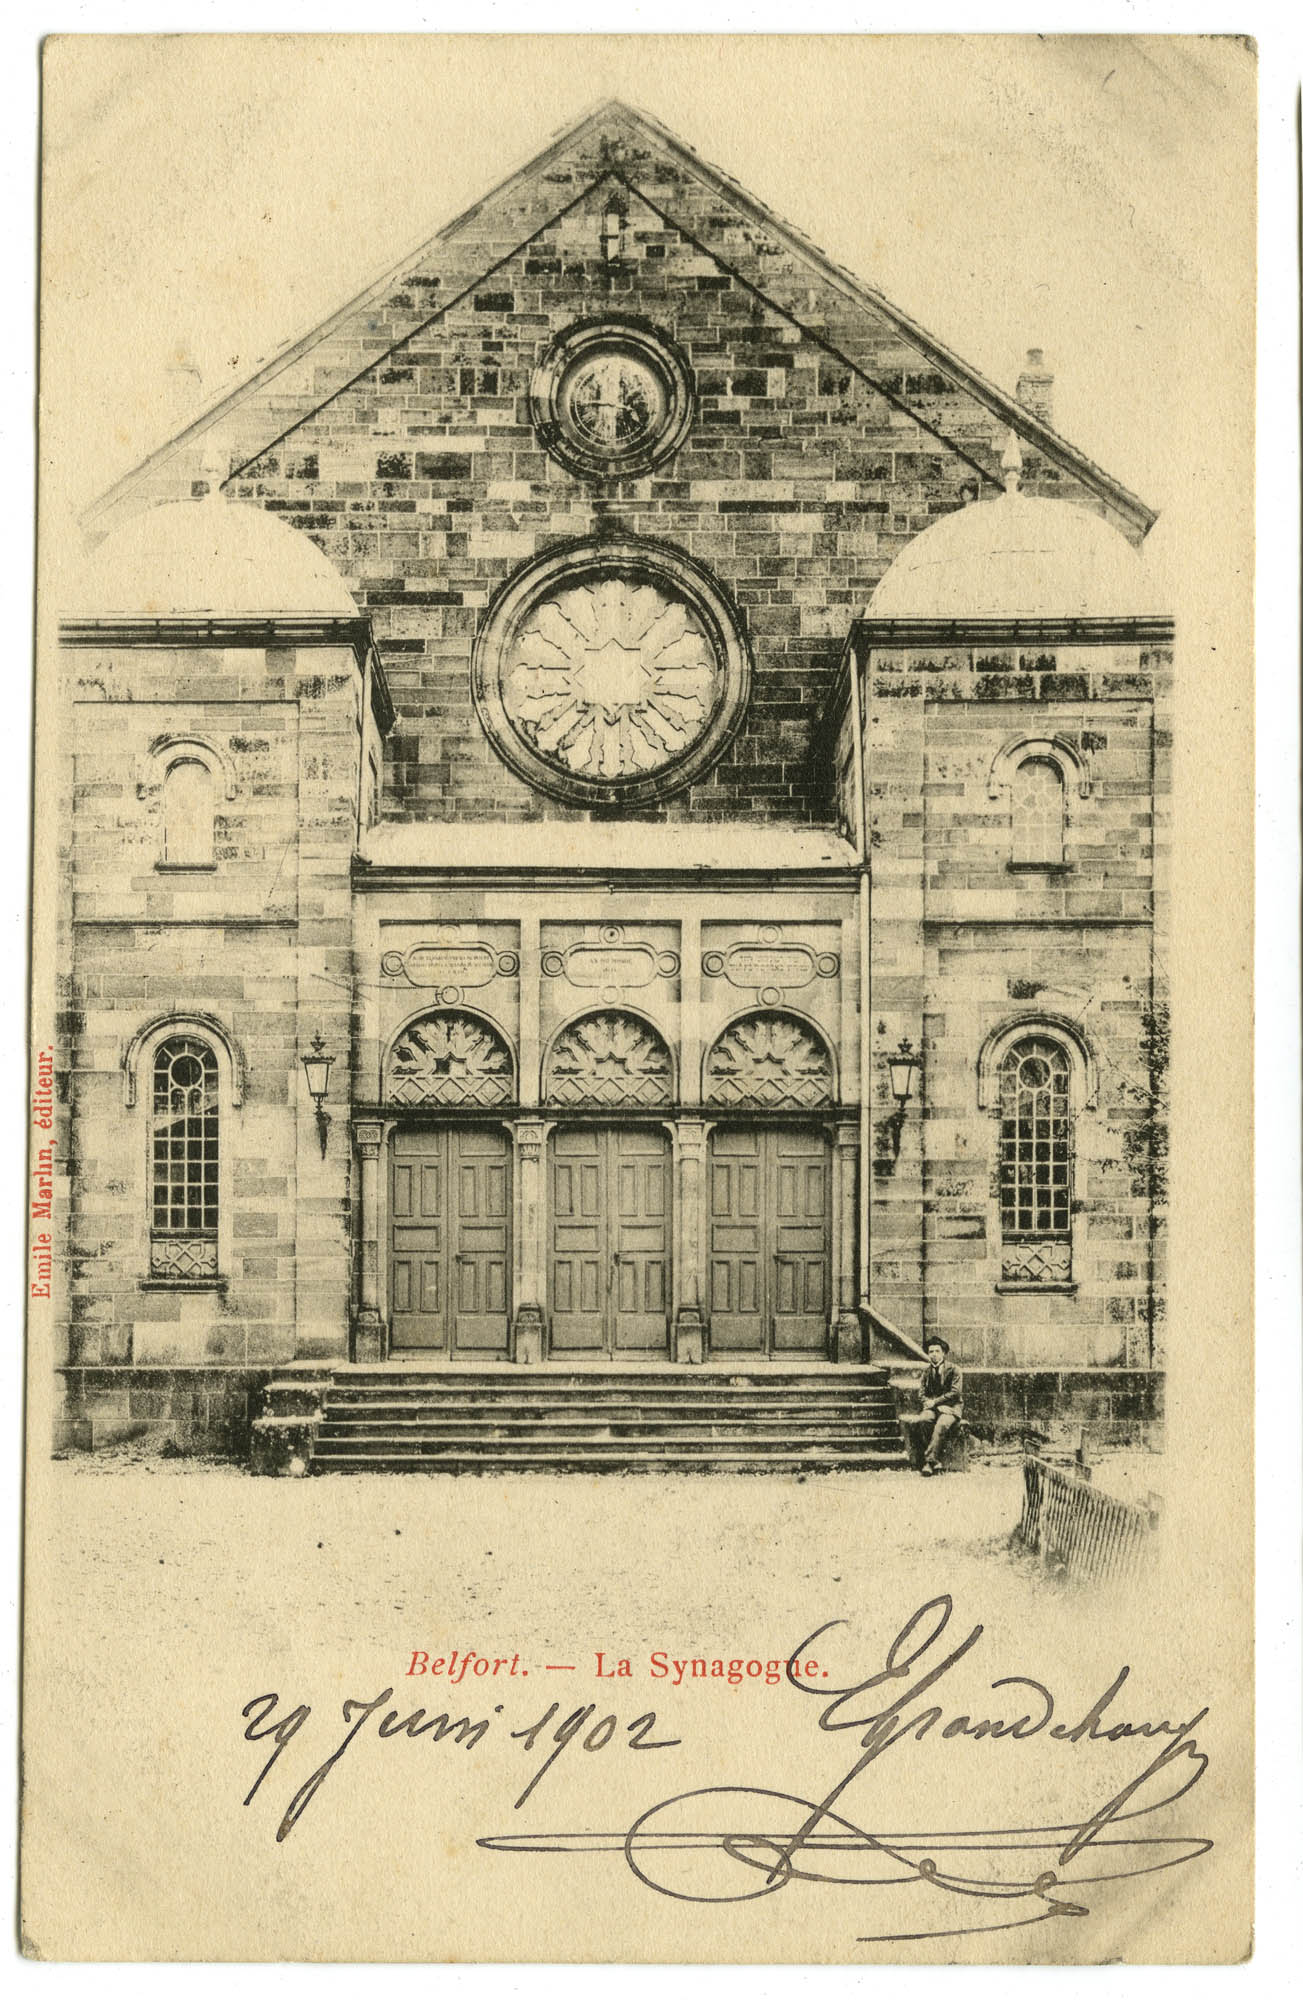 Belfort. - La Synagogue.